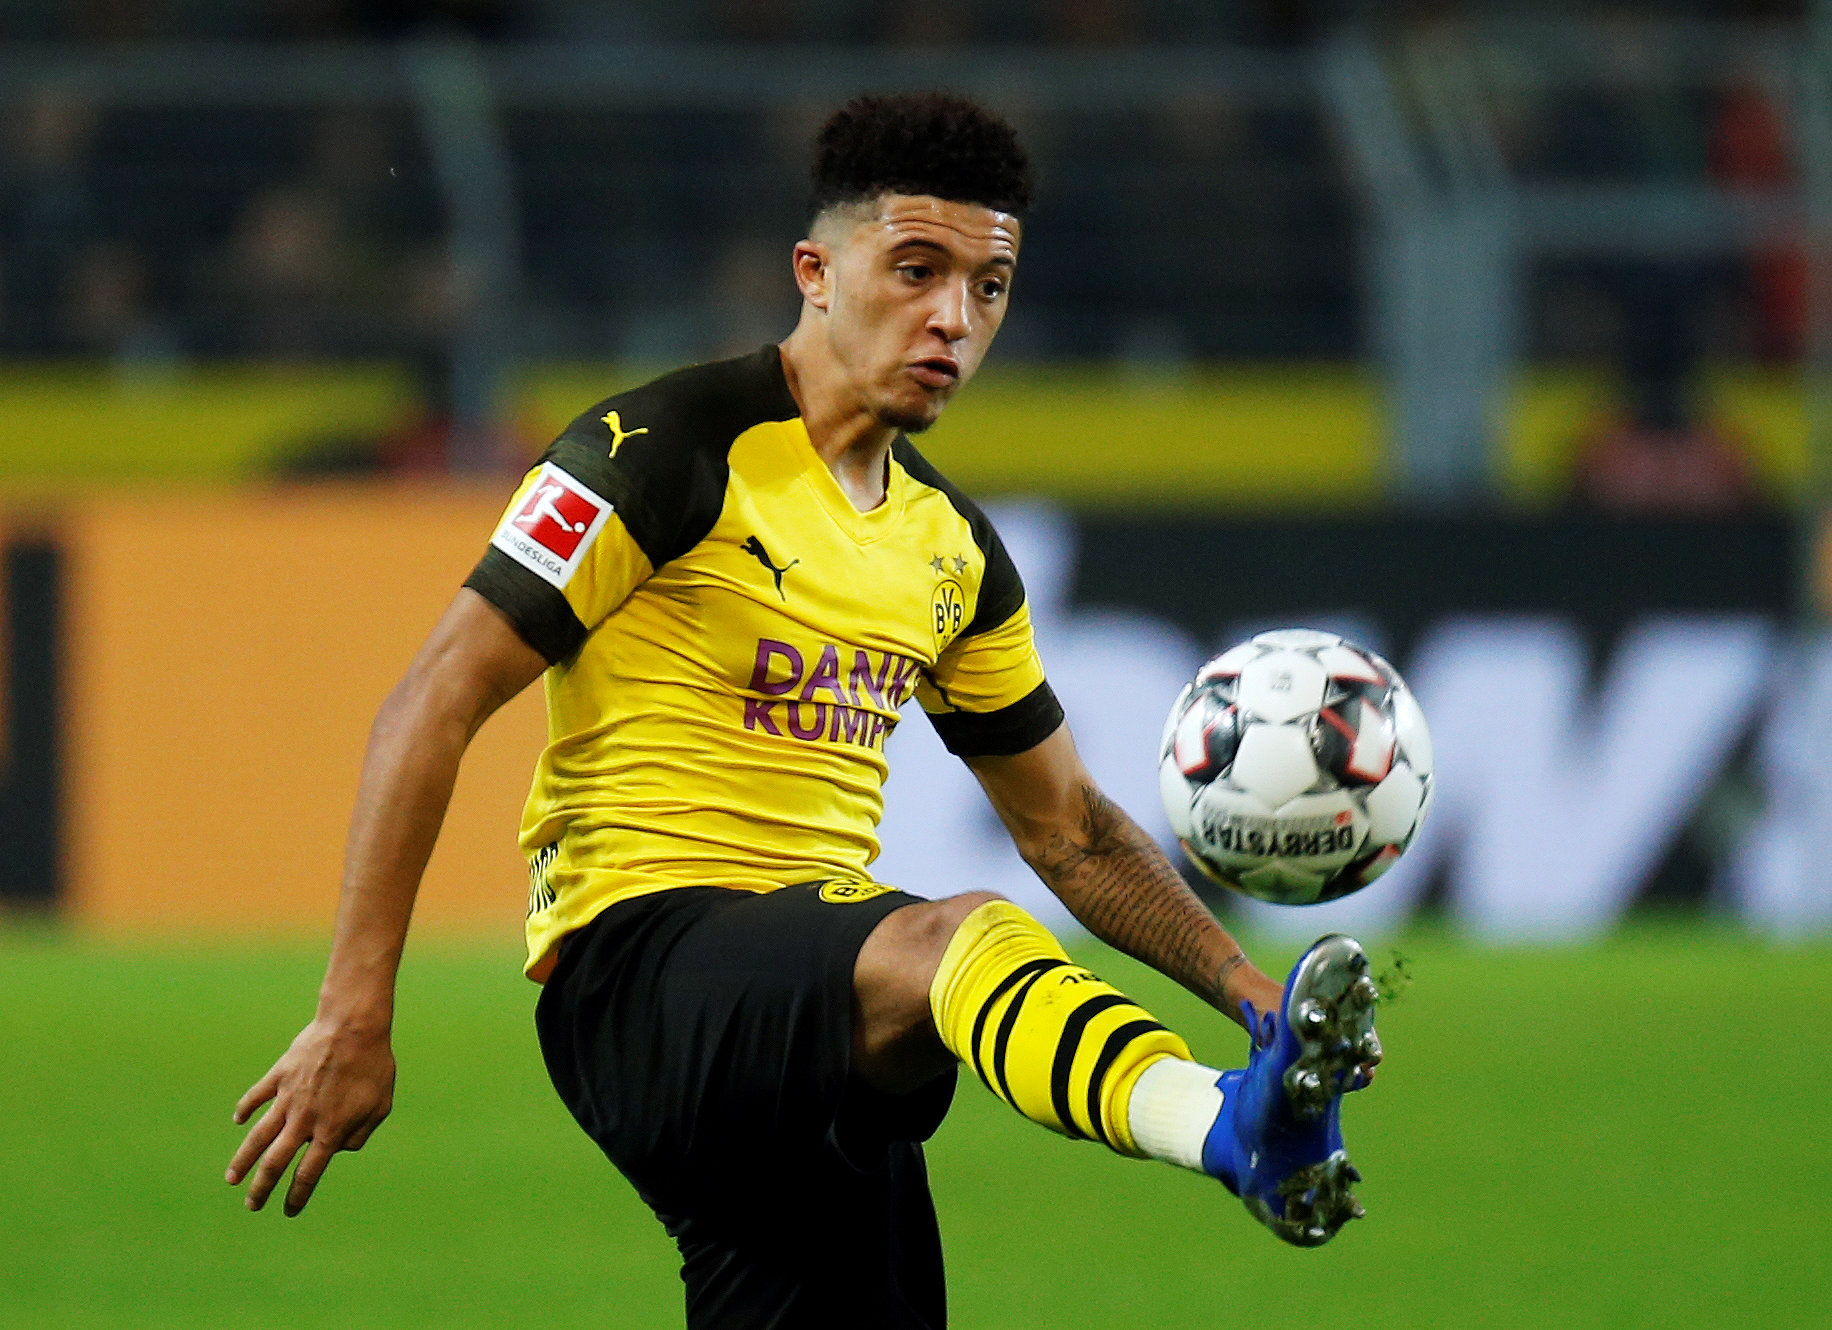 Football - Etranger - Bundesliga : Hertha Berlin-Borussia Dortmund en direct